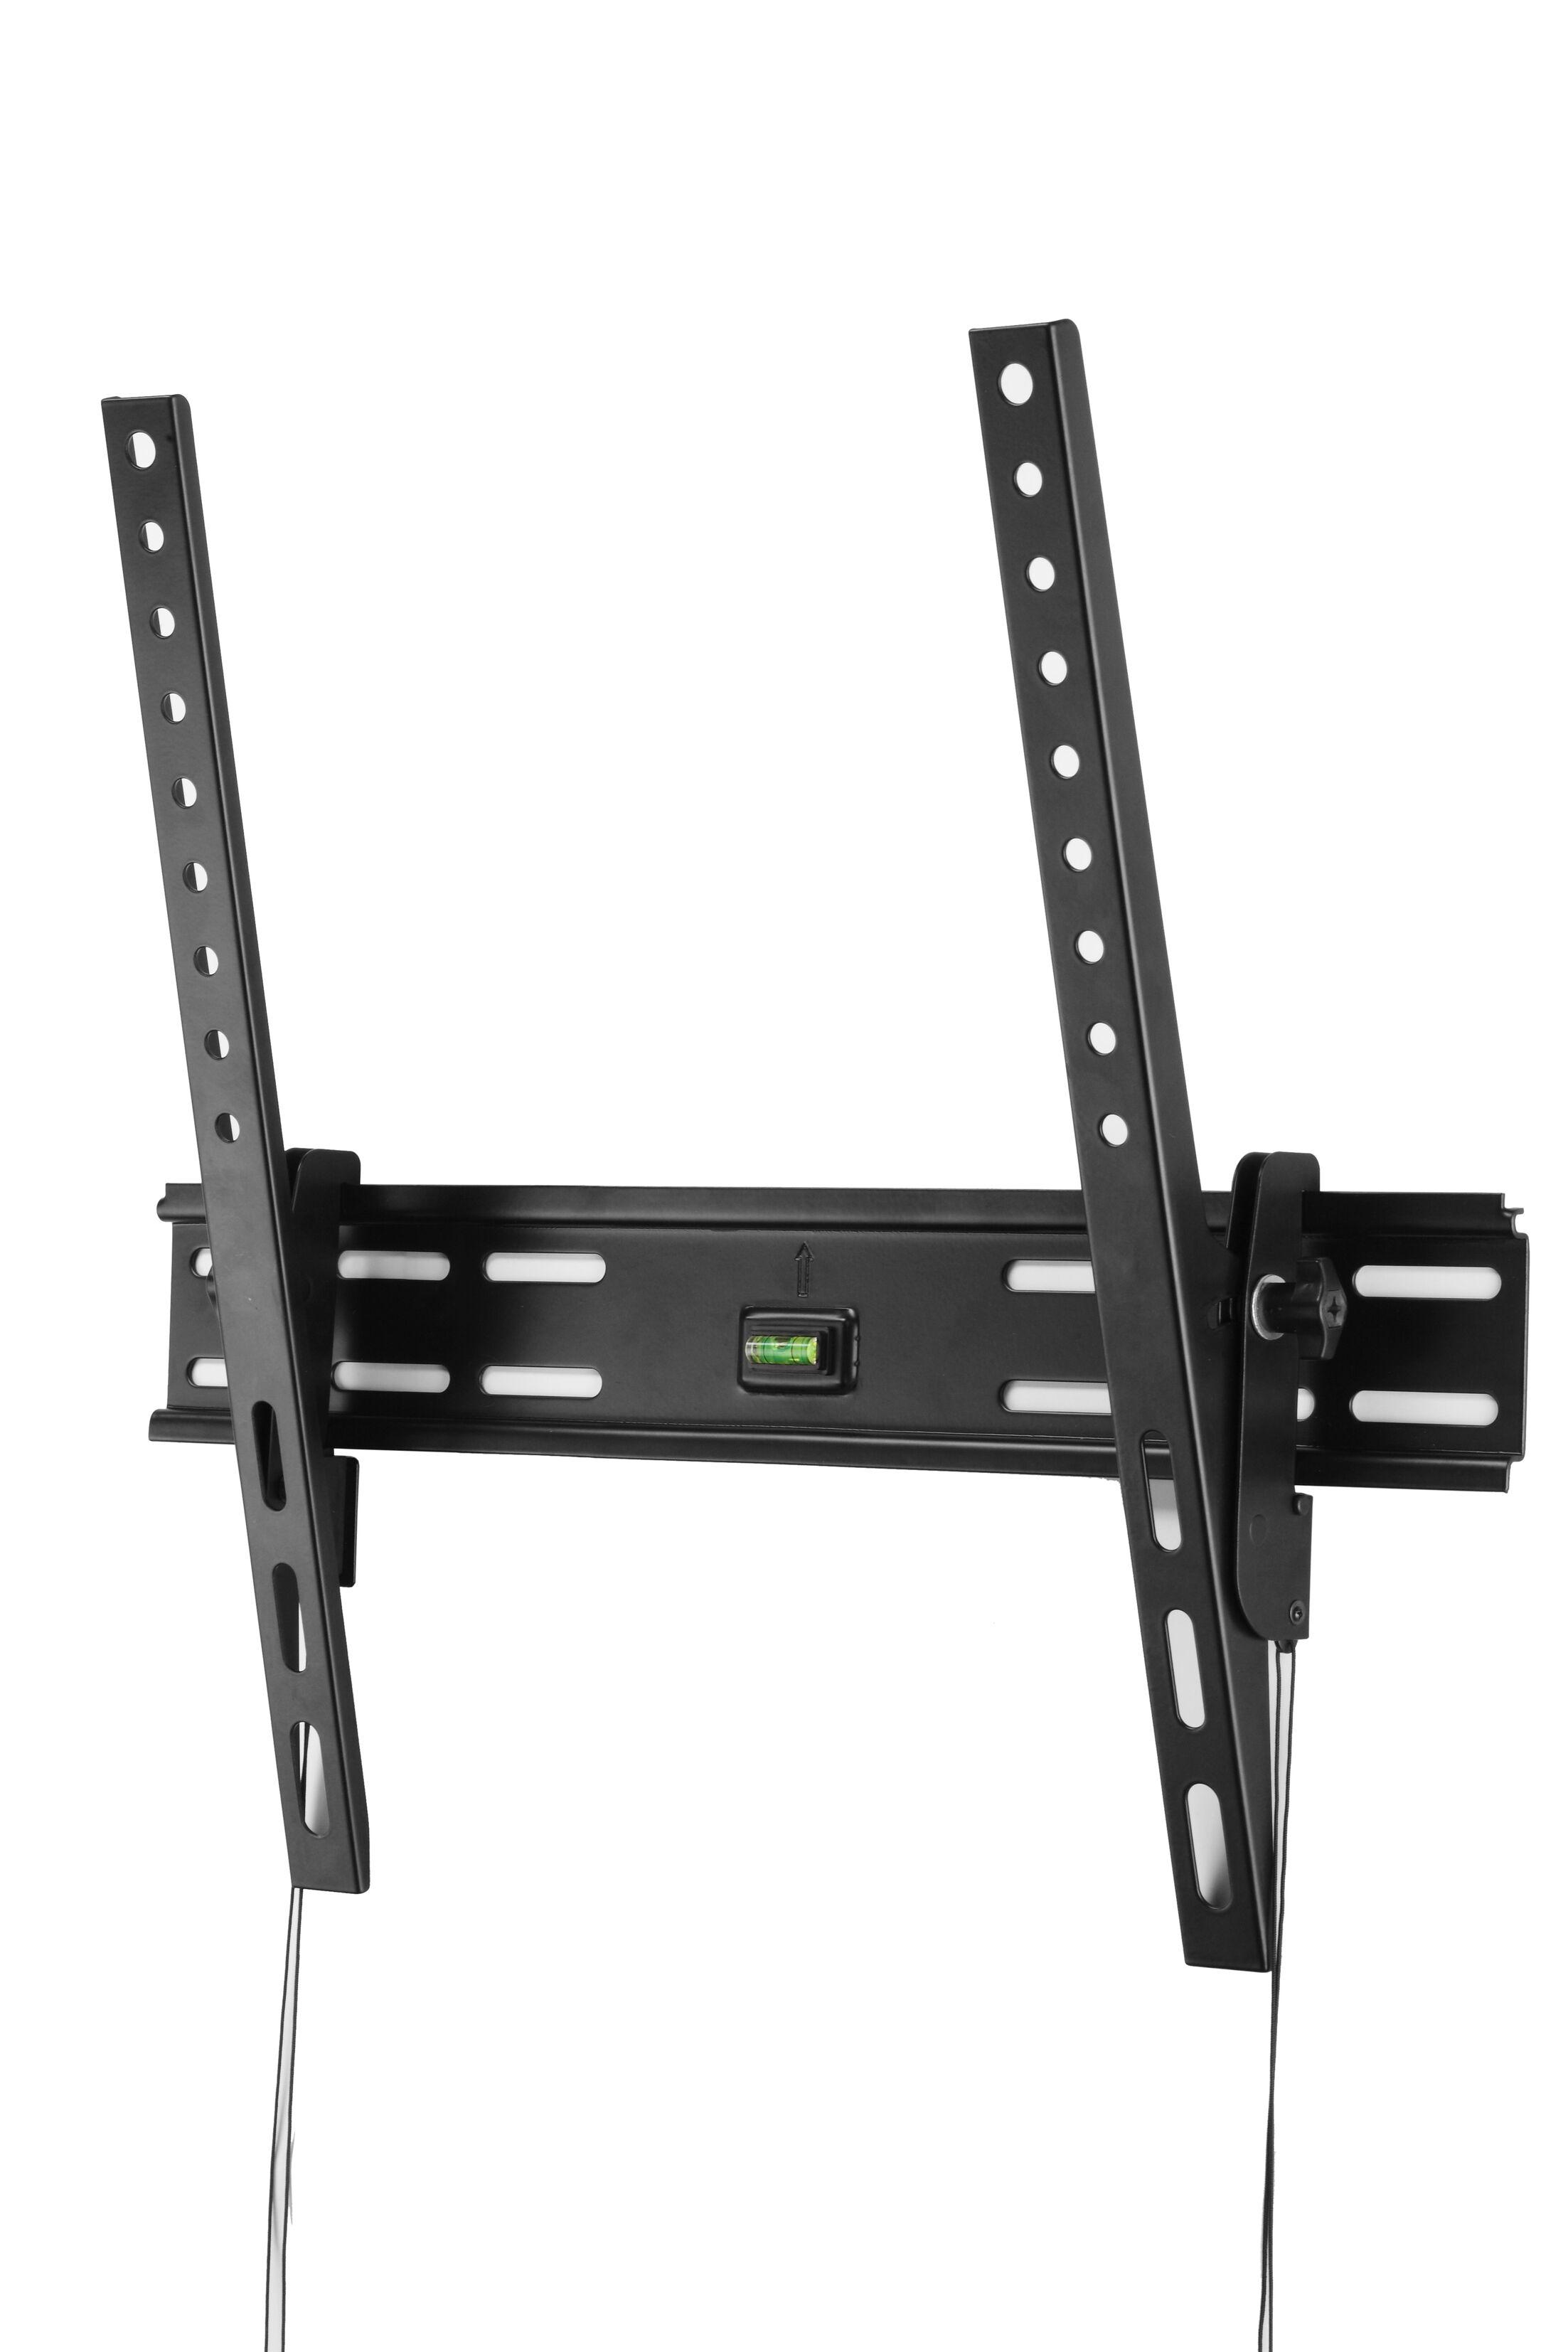 Medium tilting TV mount for 32